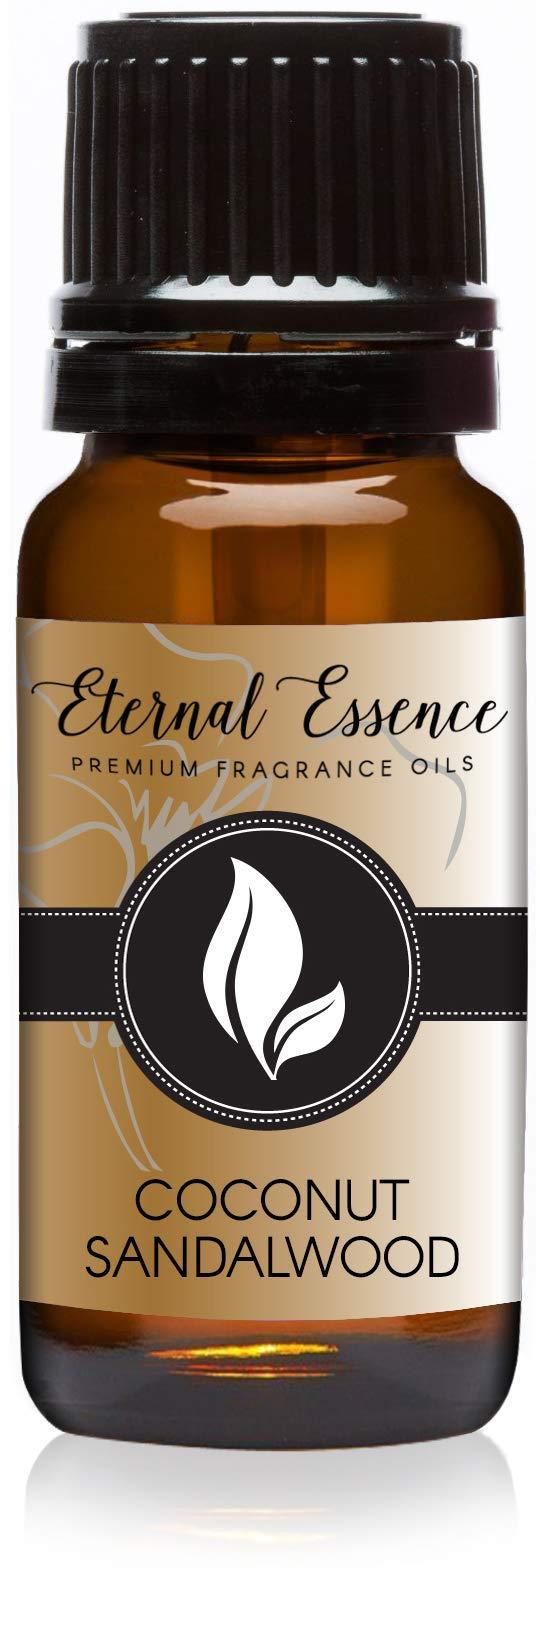 Coconut Sandalwood - Premium Grade Fragrance Oils - 10ml - Scented Oil